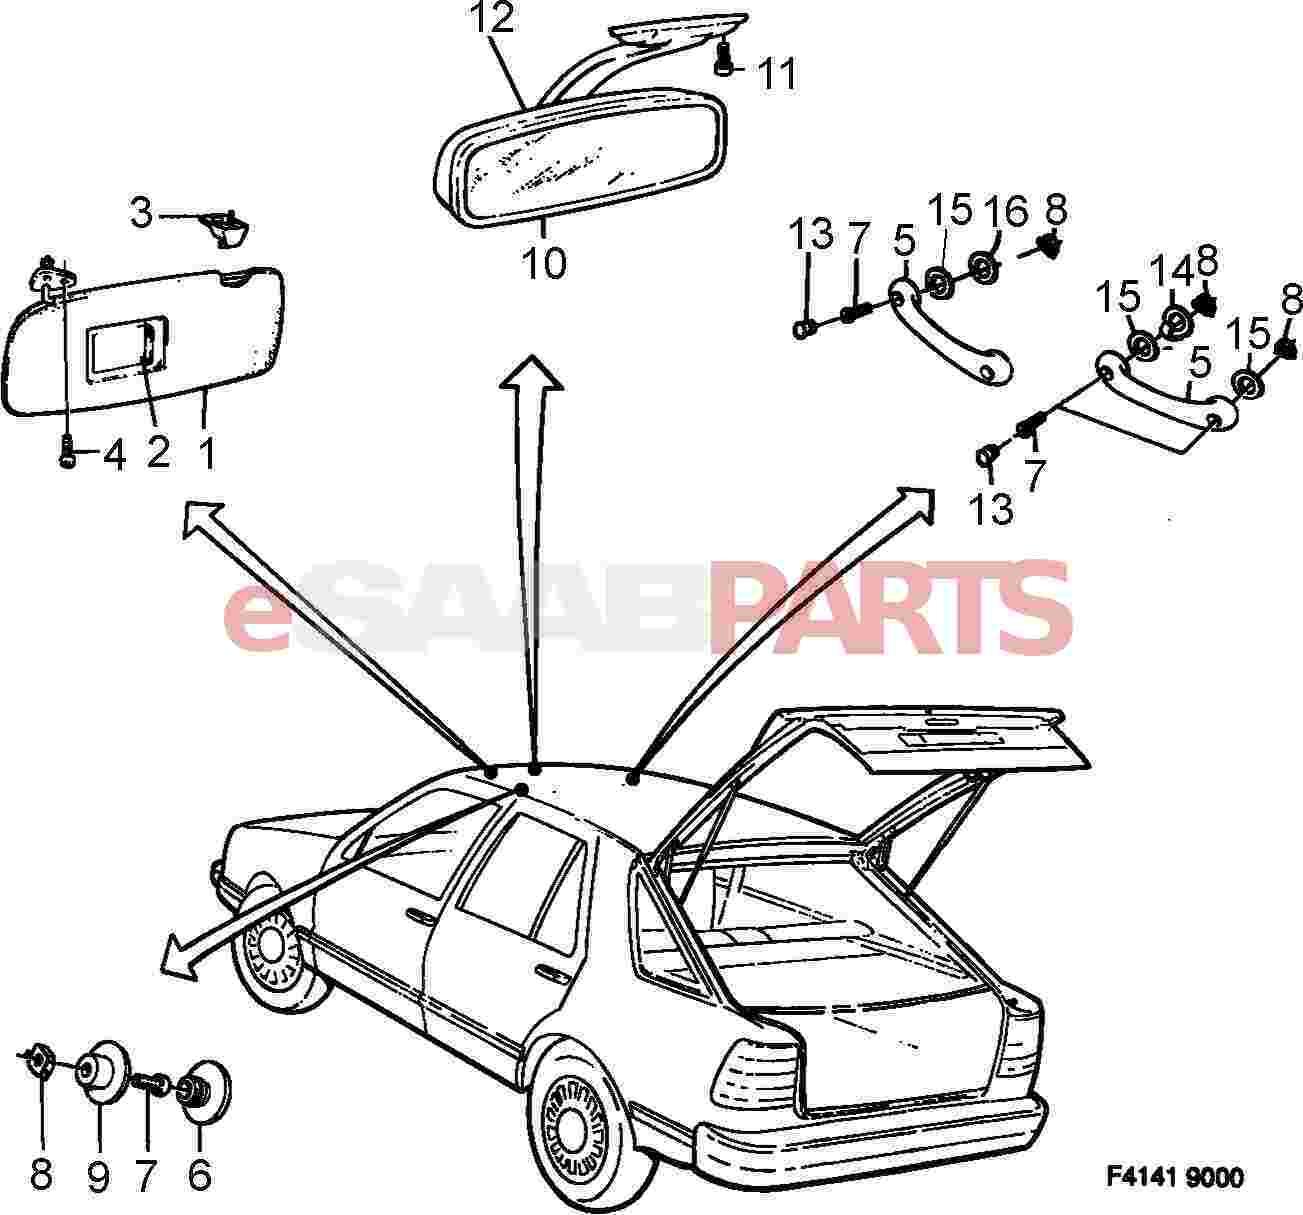 tags: #dana 60 front axle diagram#rear axle diagram#chevy front axle parts  breakdown#ford dana 50 front axle#chysler 200 front axle diagram#dana front  axle